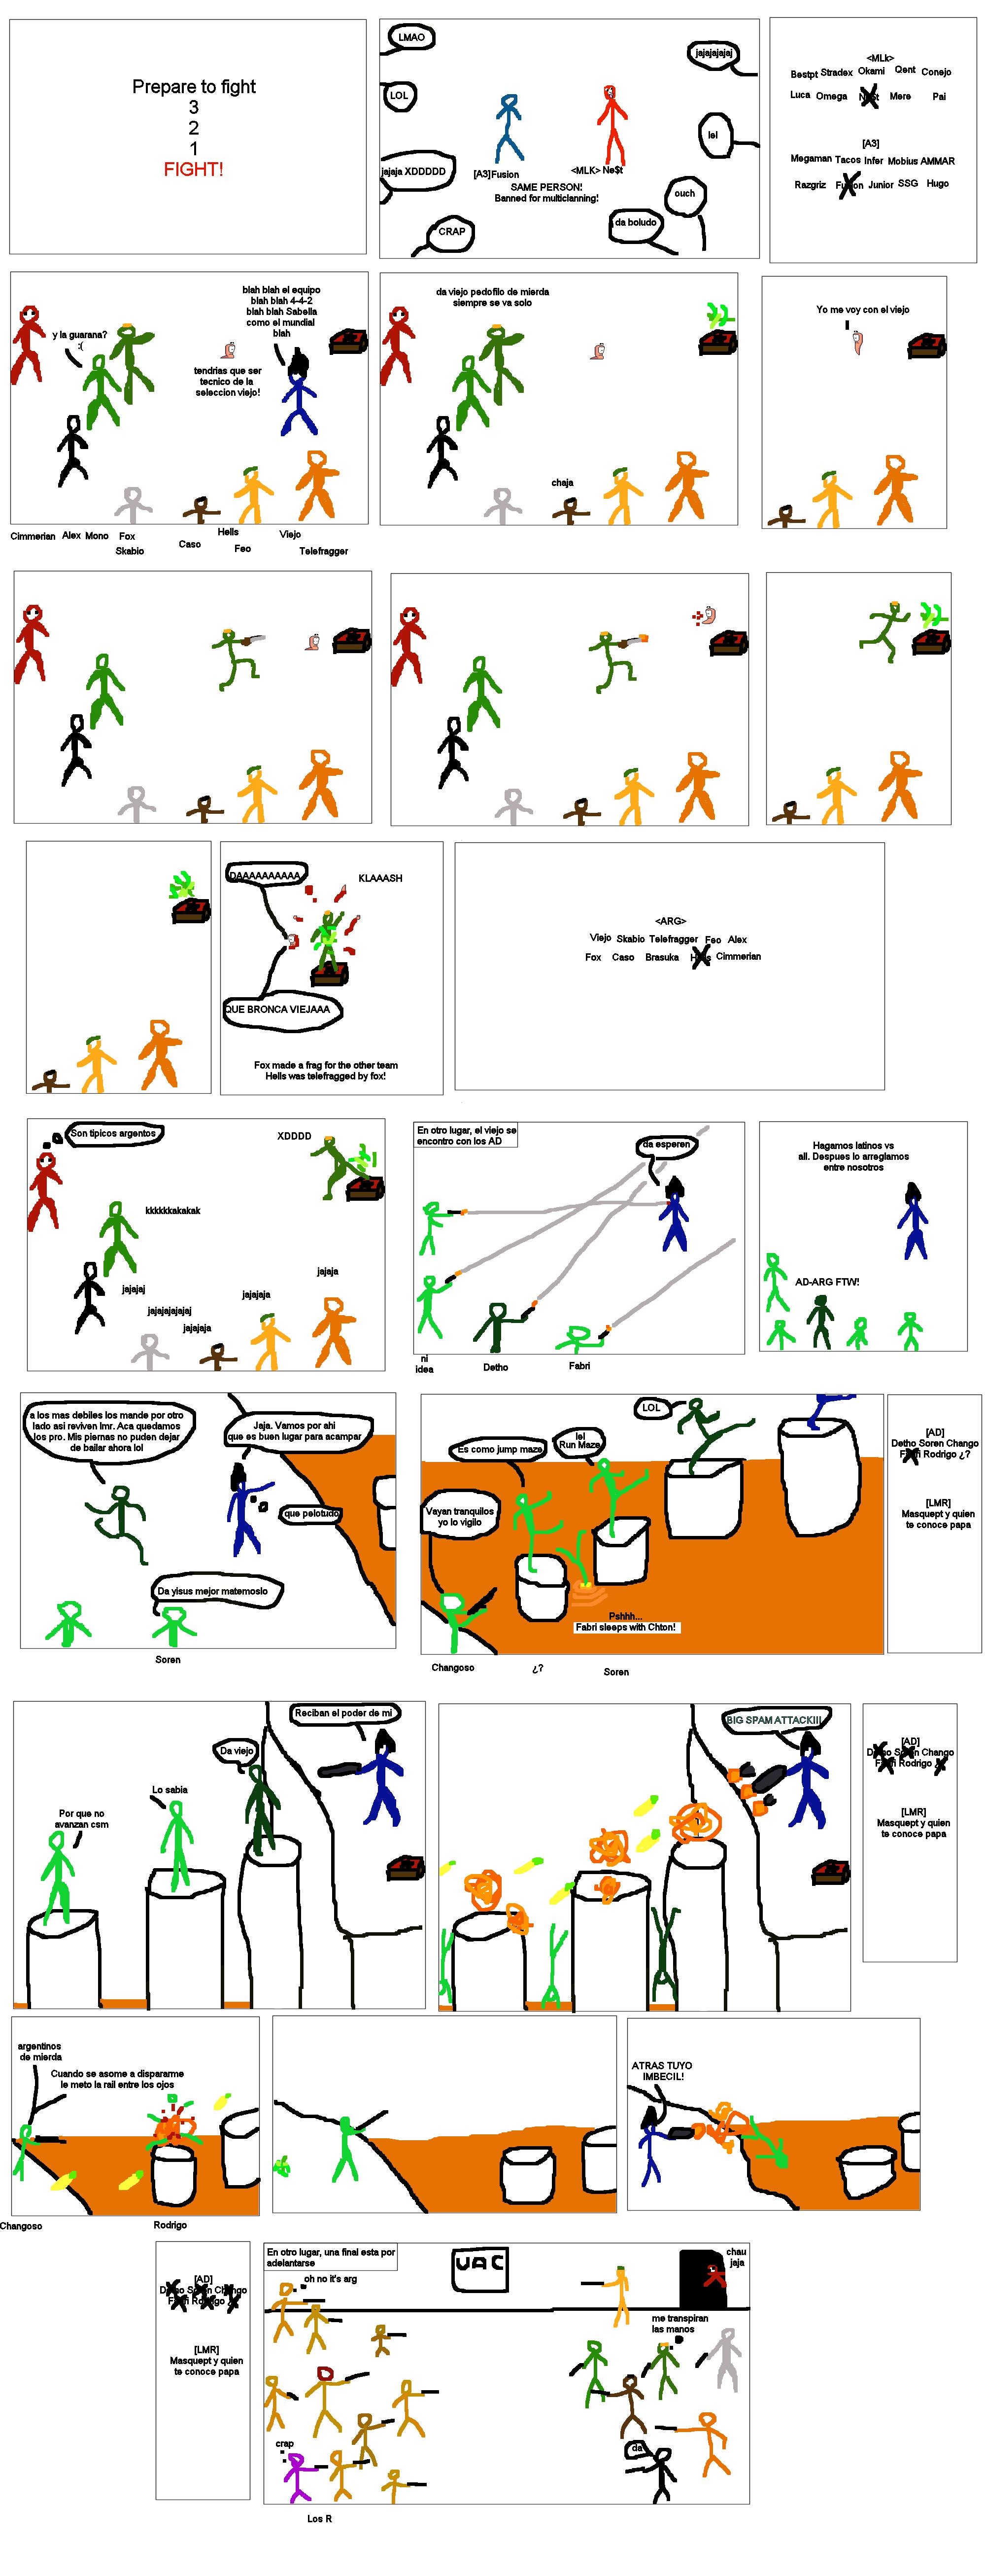 Historieta torneo tlms dragonbolero Pagina_2